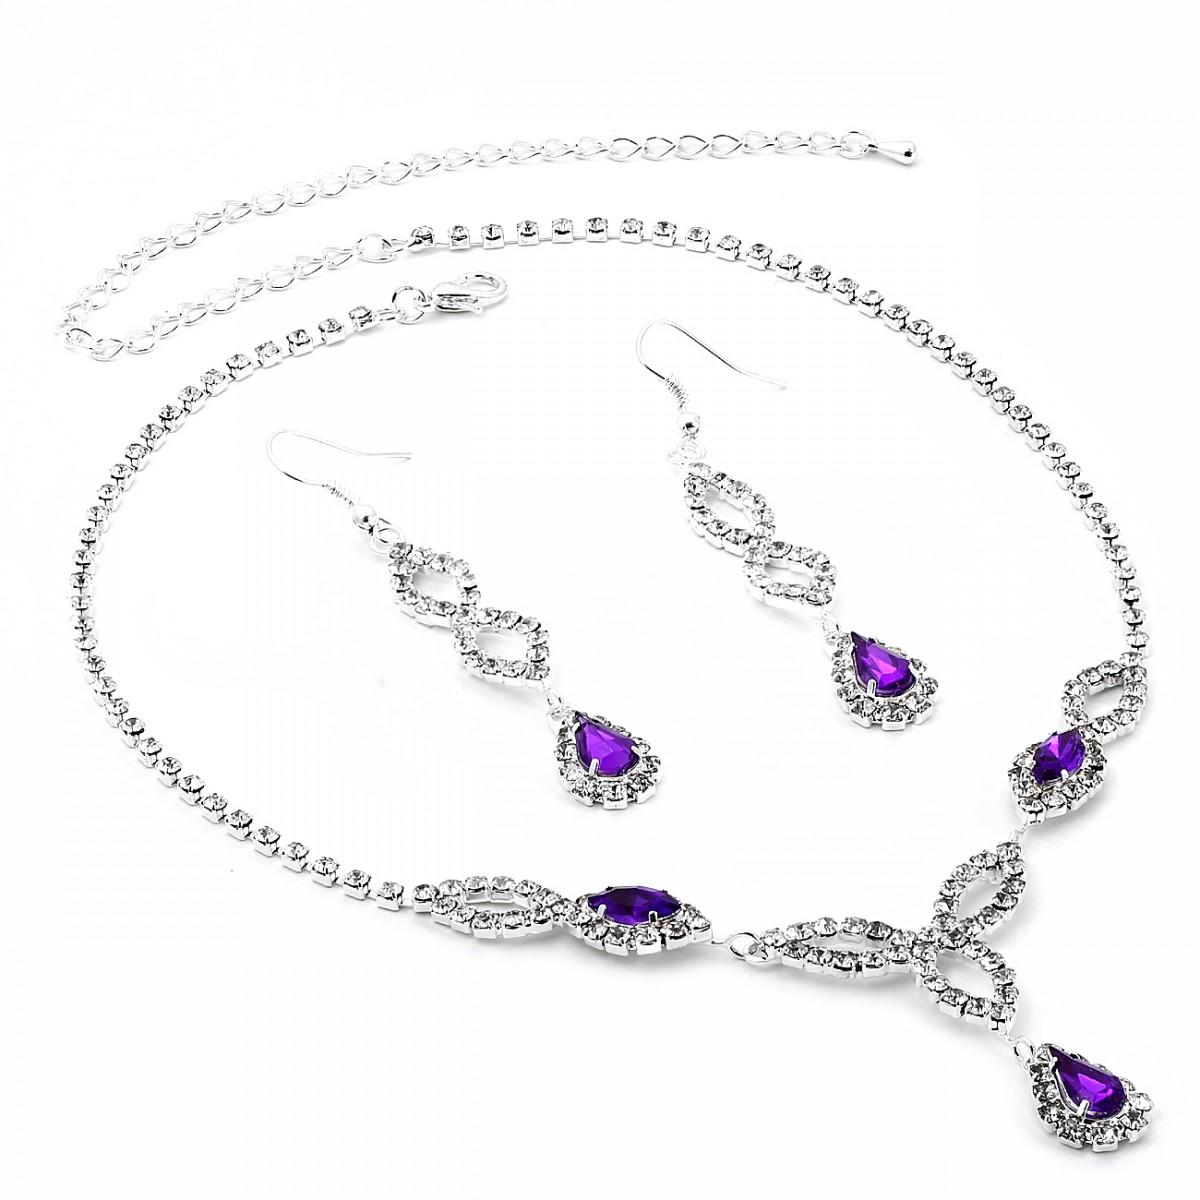 Gemstone Rings  Diamond Sapphire Emerald Sets  Blue Nile